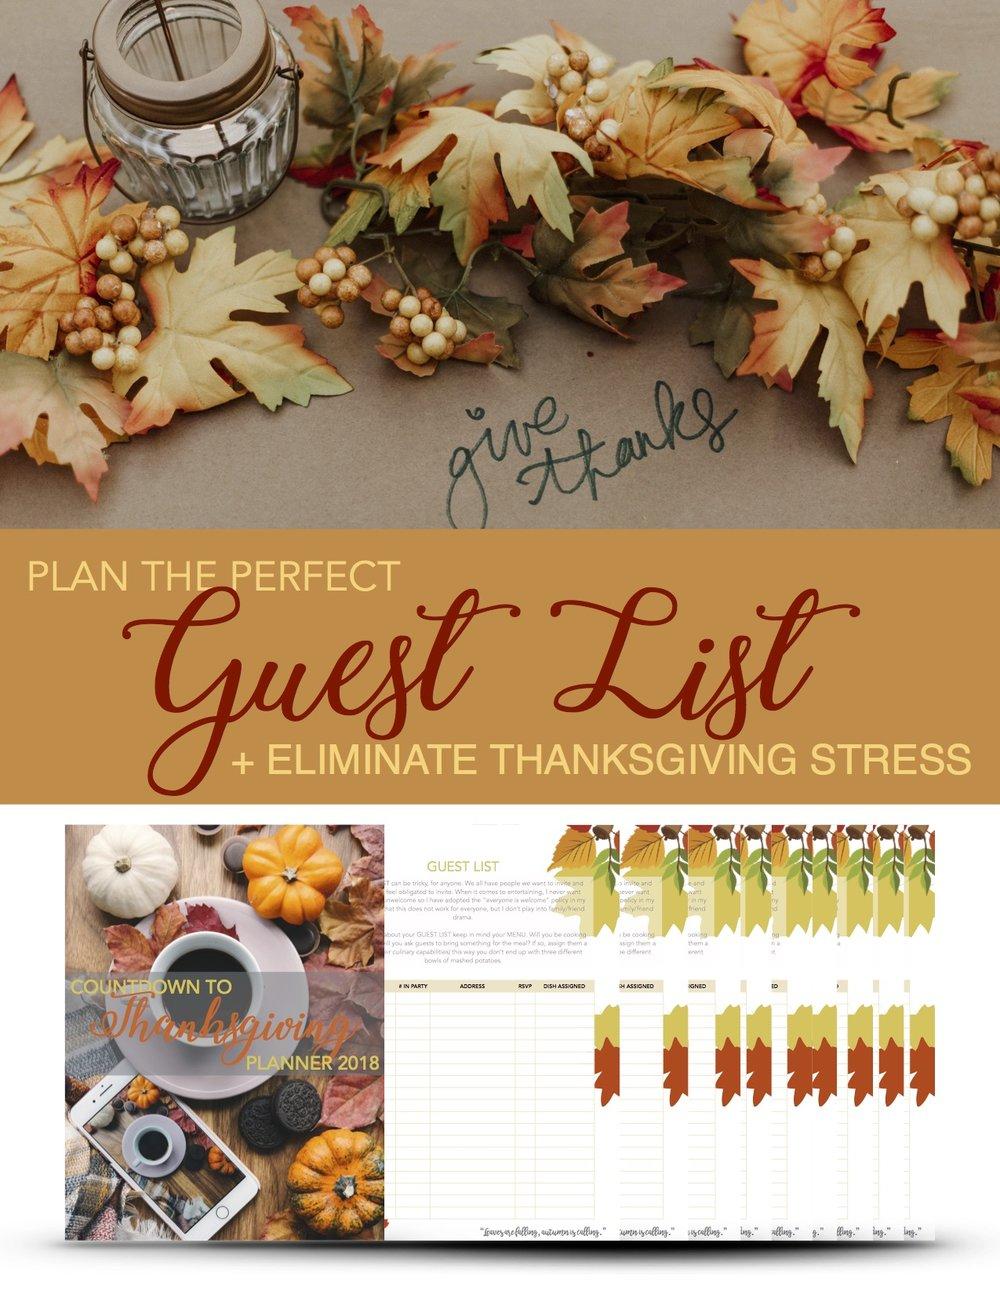 Guest List Graphic.jpg